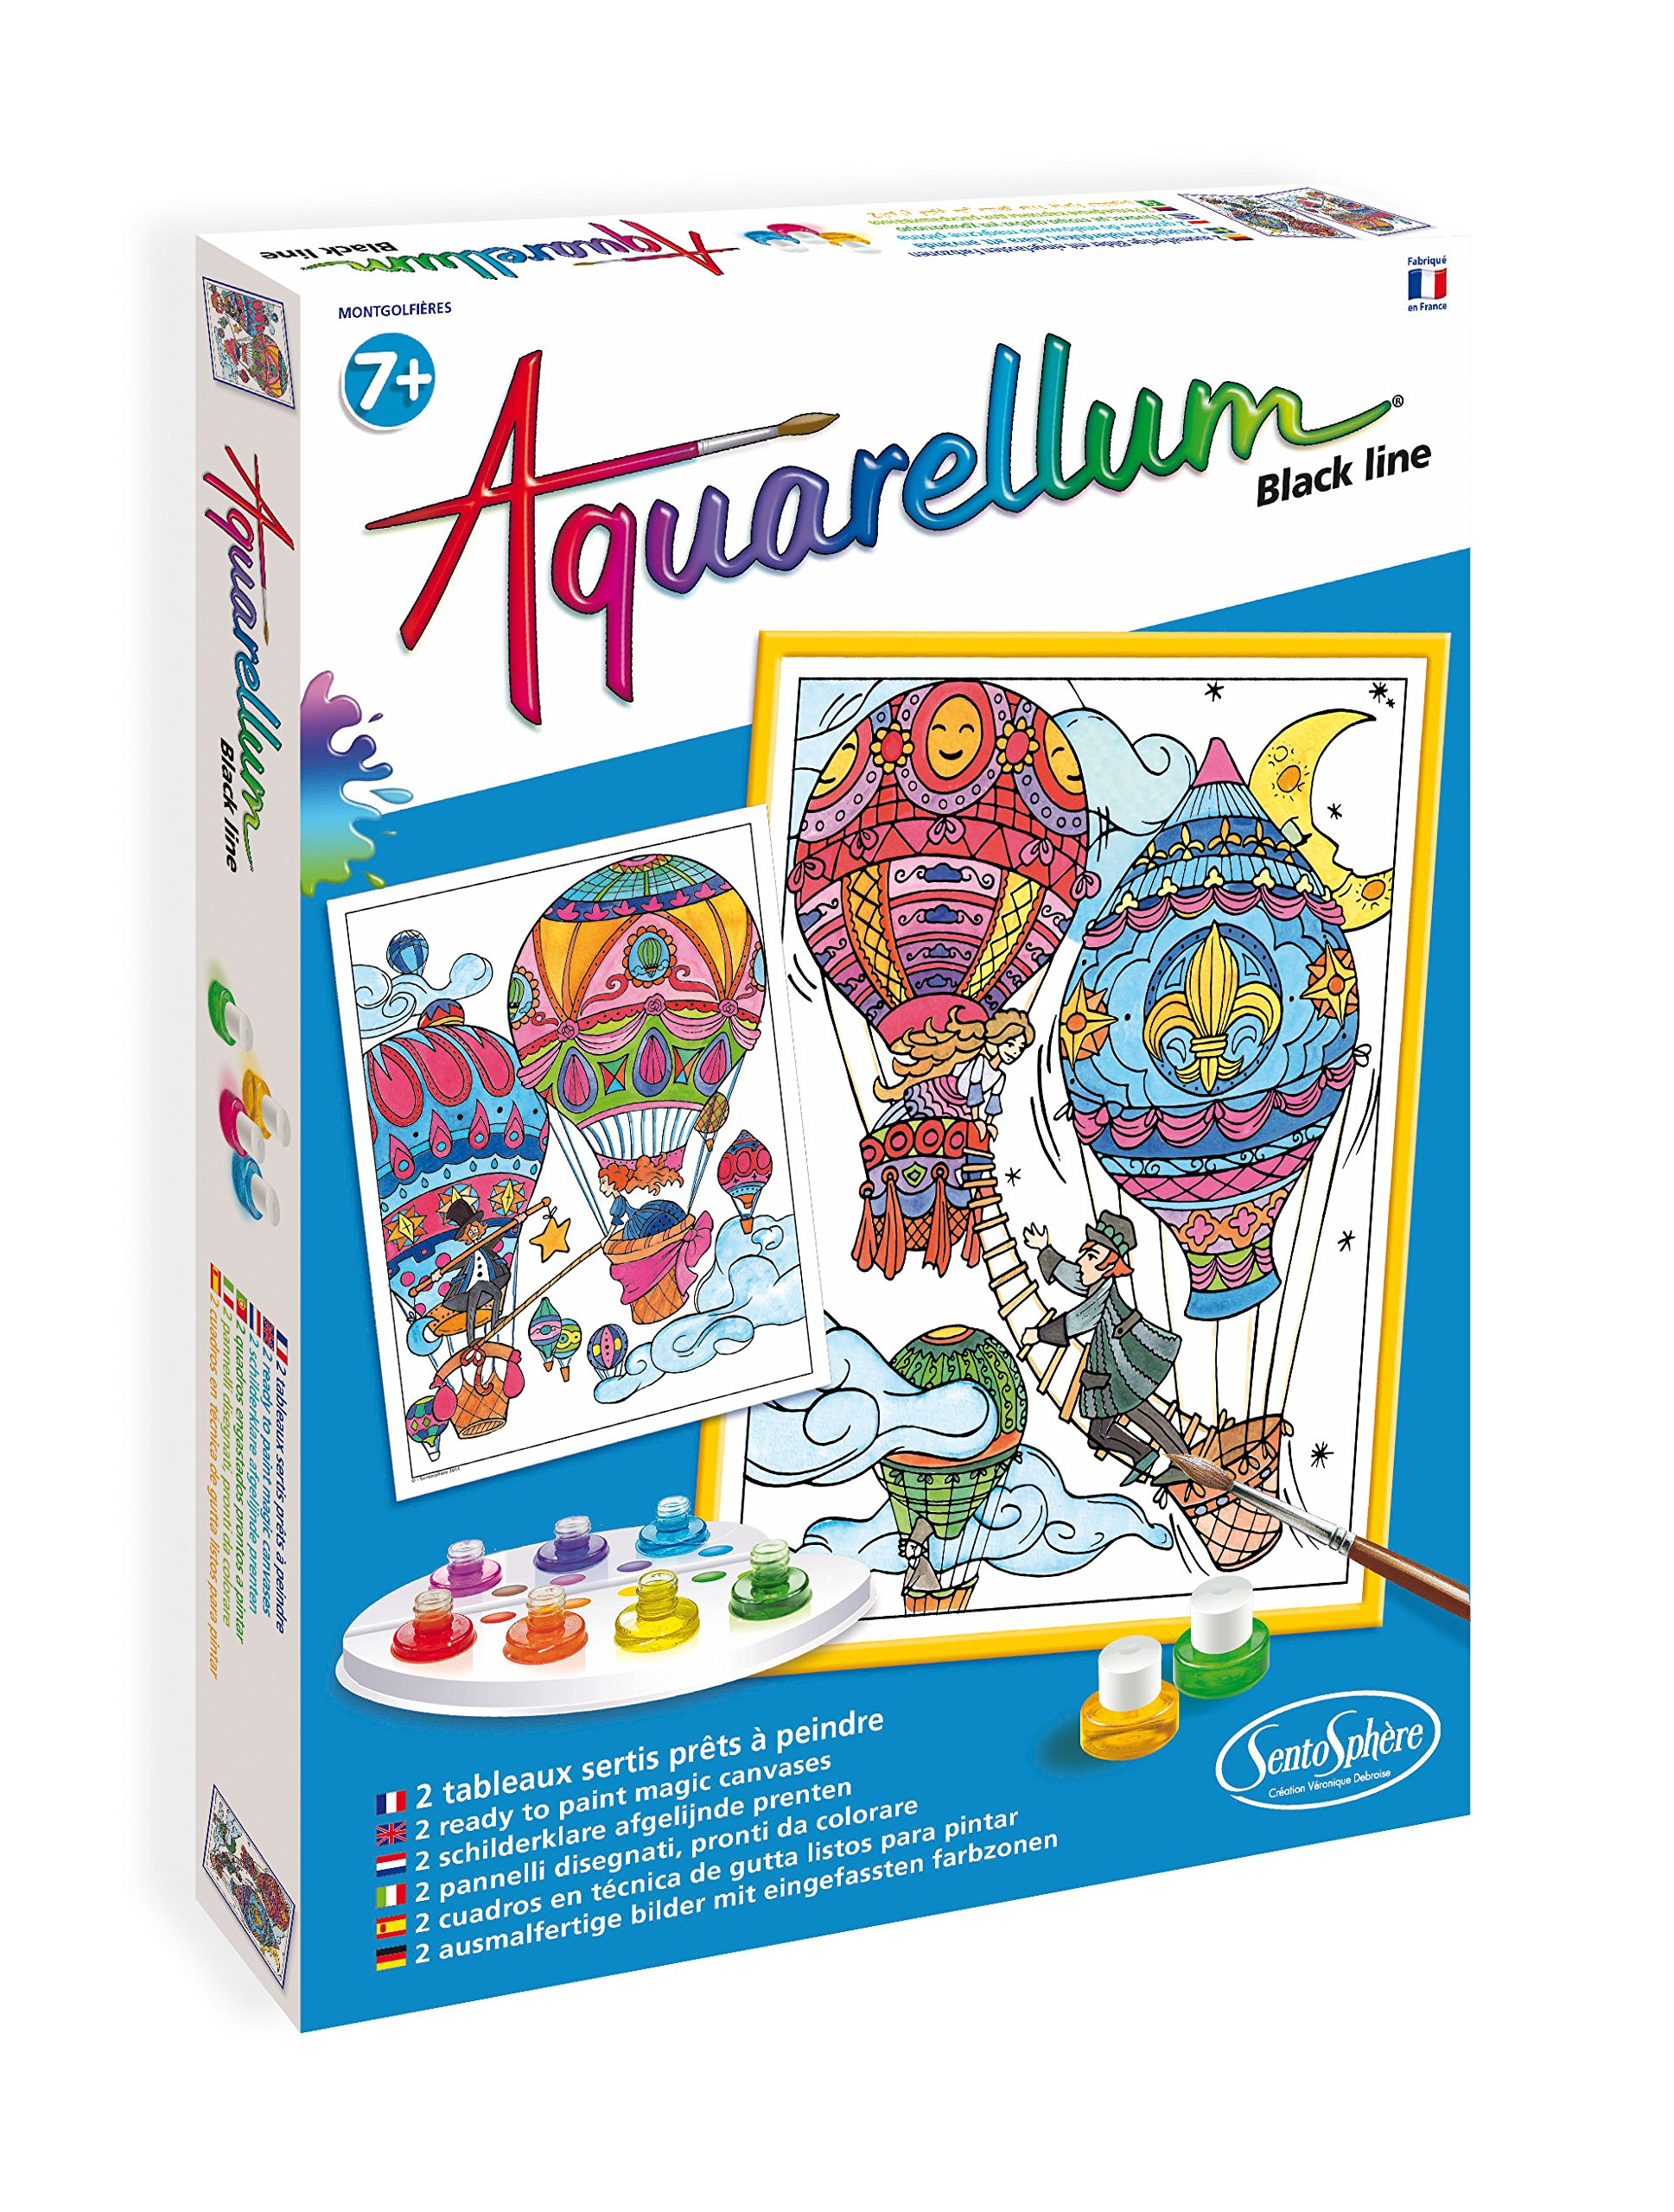 Sentosphère-SENTOSPHERE Aquarellum-610-Leisure Creatif Black Line: Balloons by Sentosphère